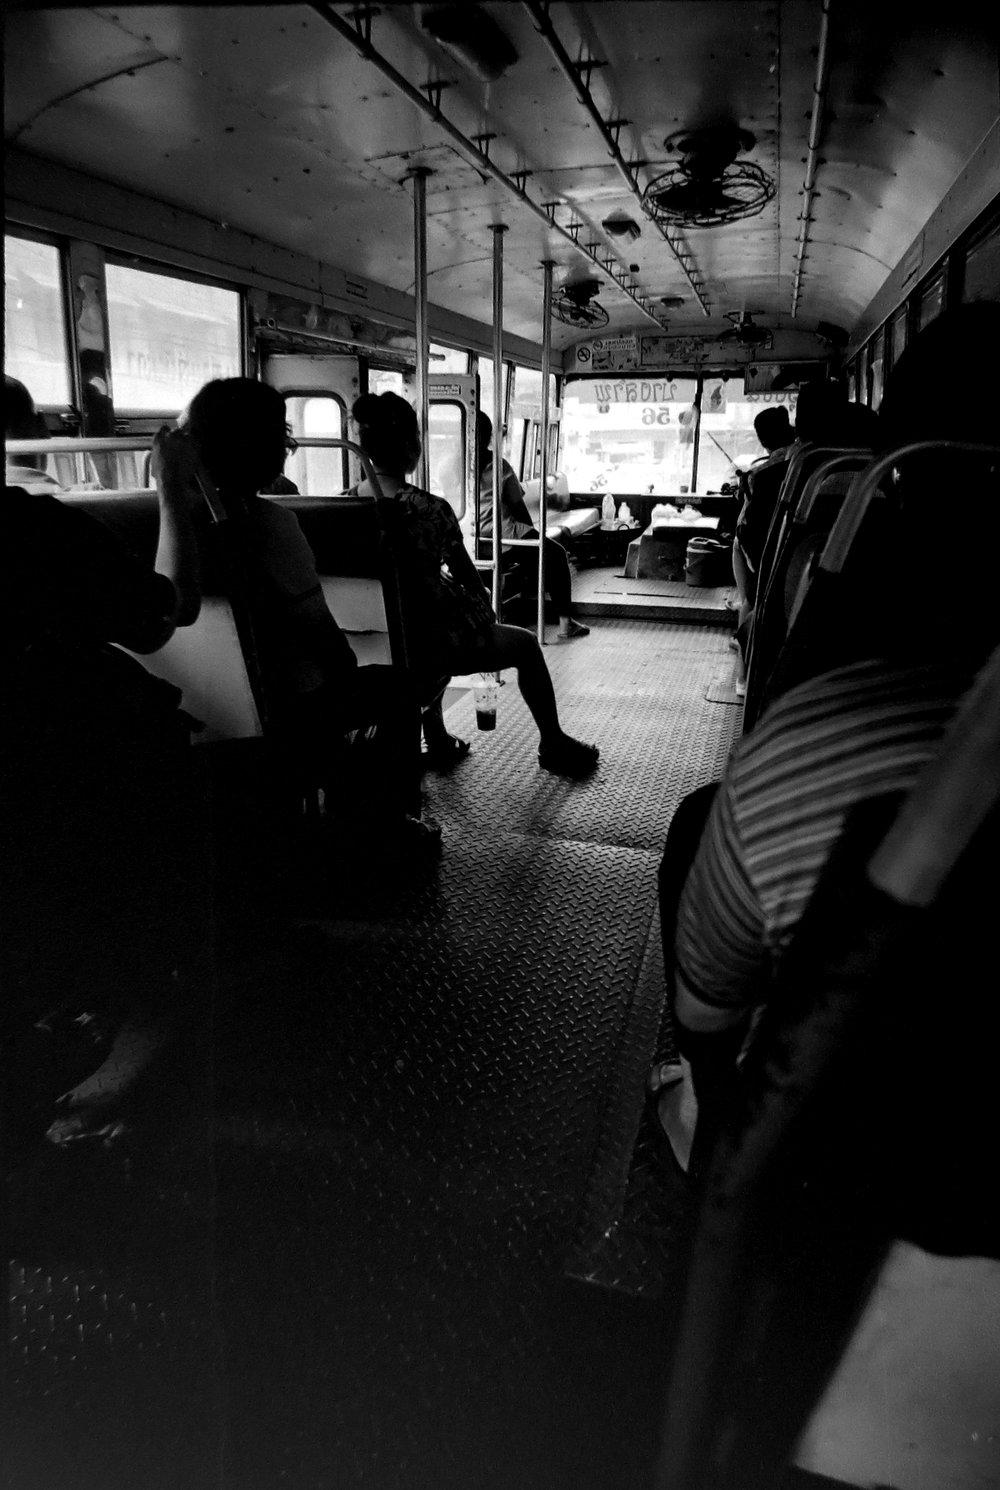 Chromacomaphoto street photography Bangkok Leica M3 super angulon 21mm 3 4 tri x Thailand film (6).JPG